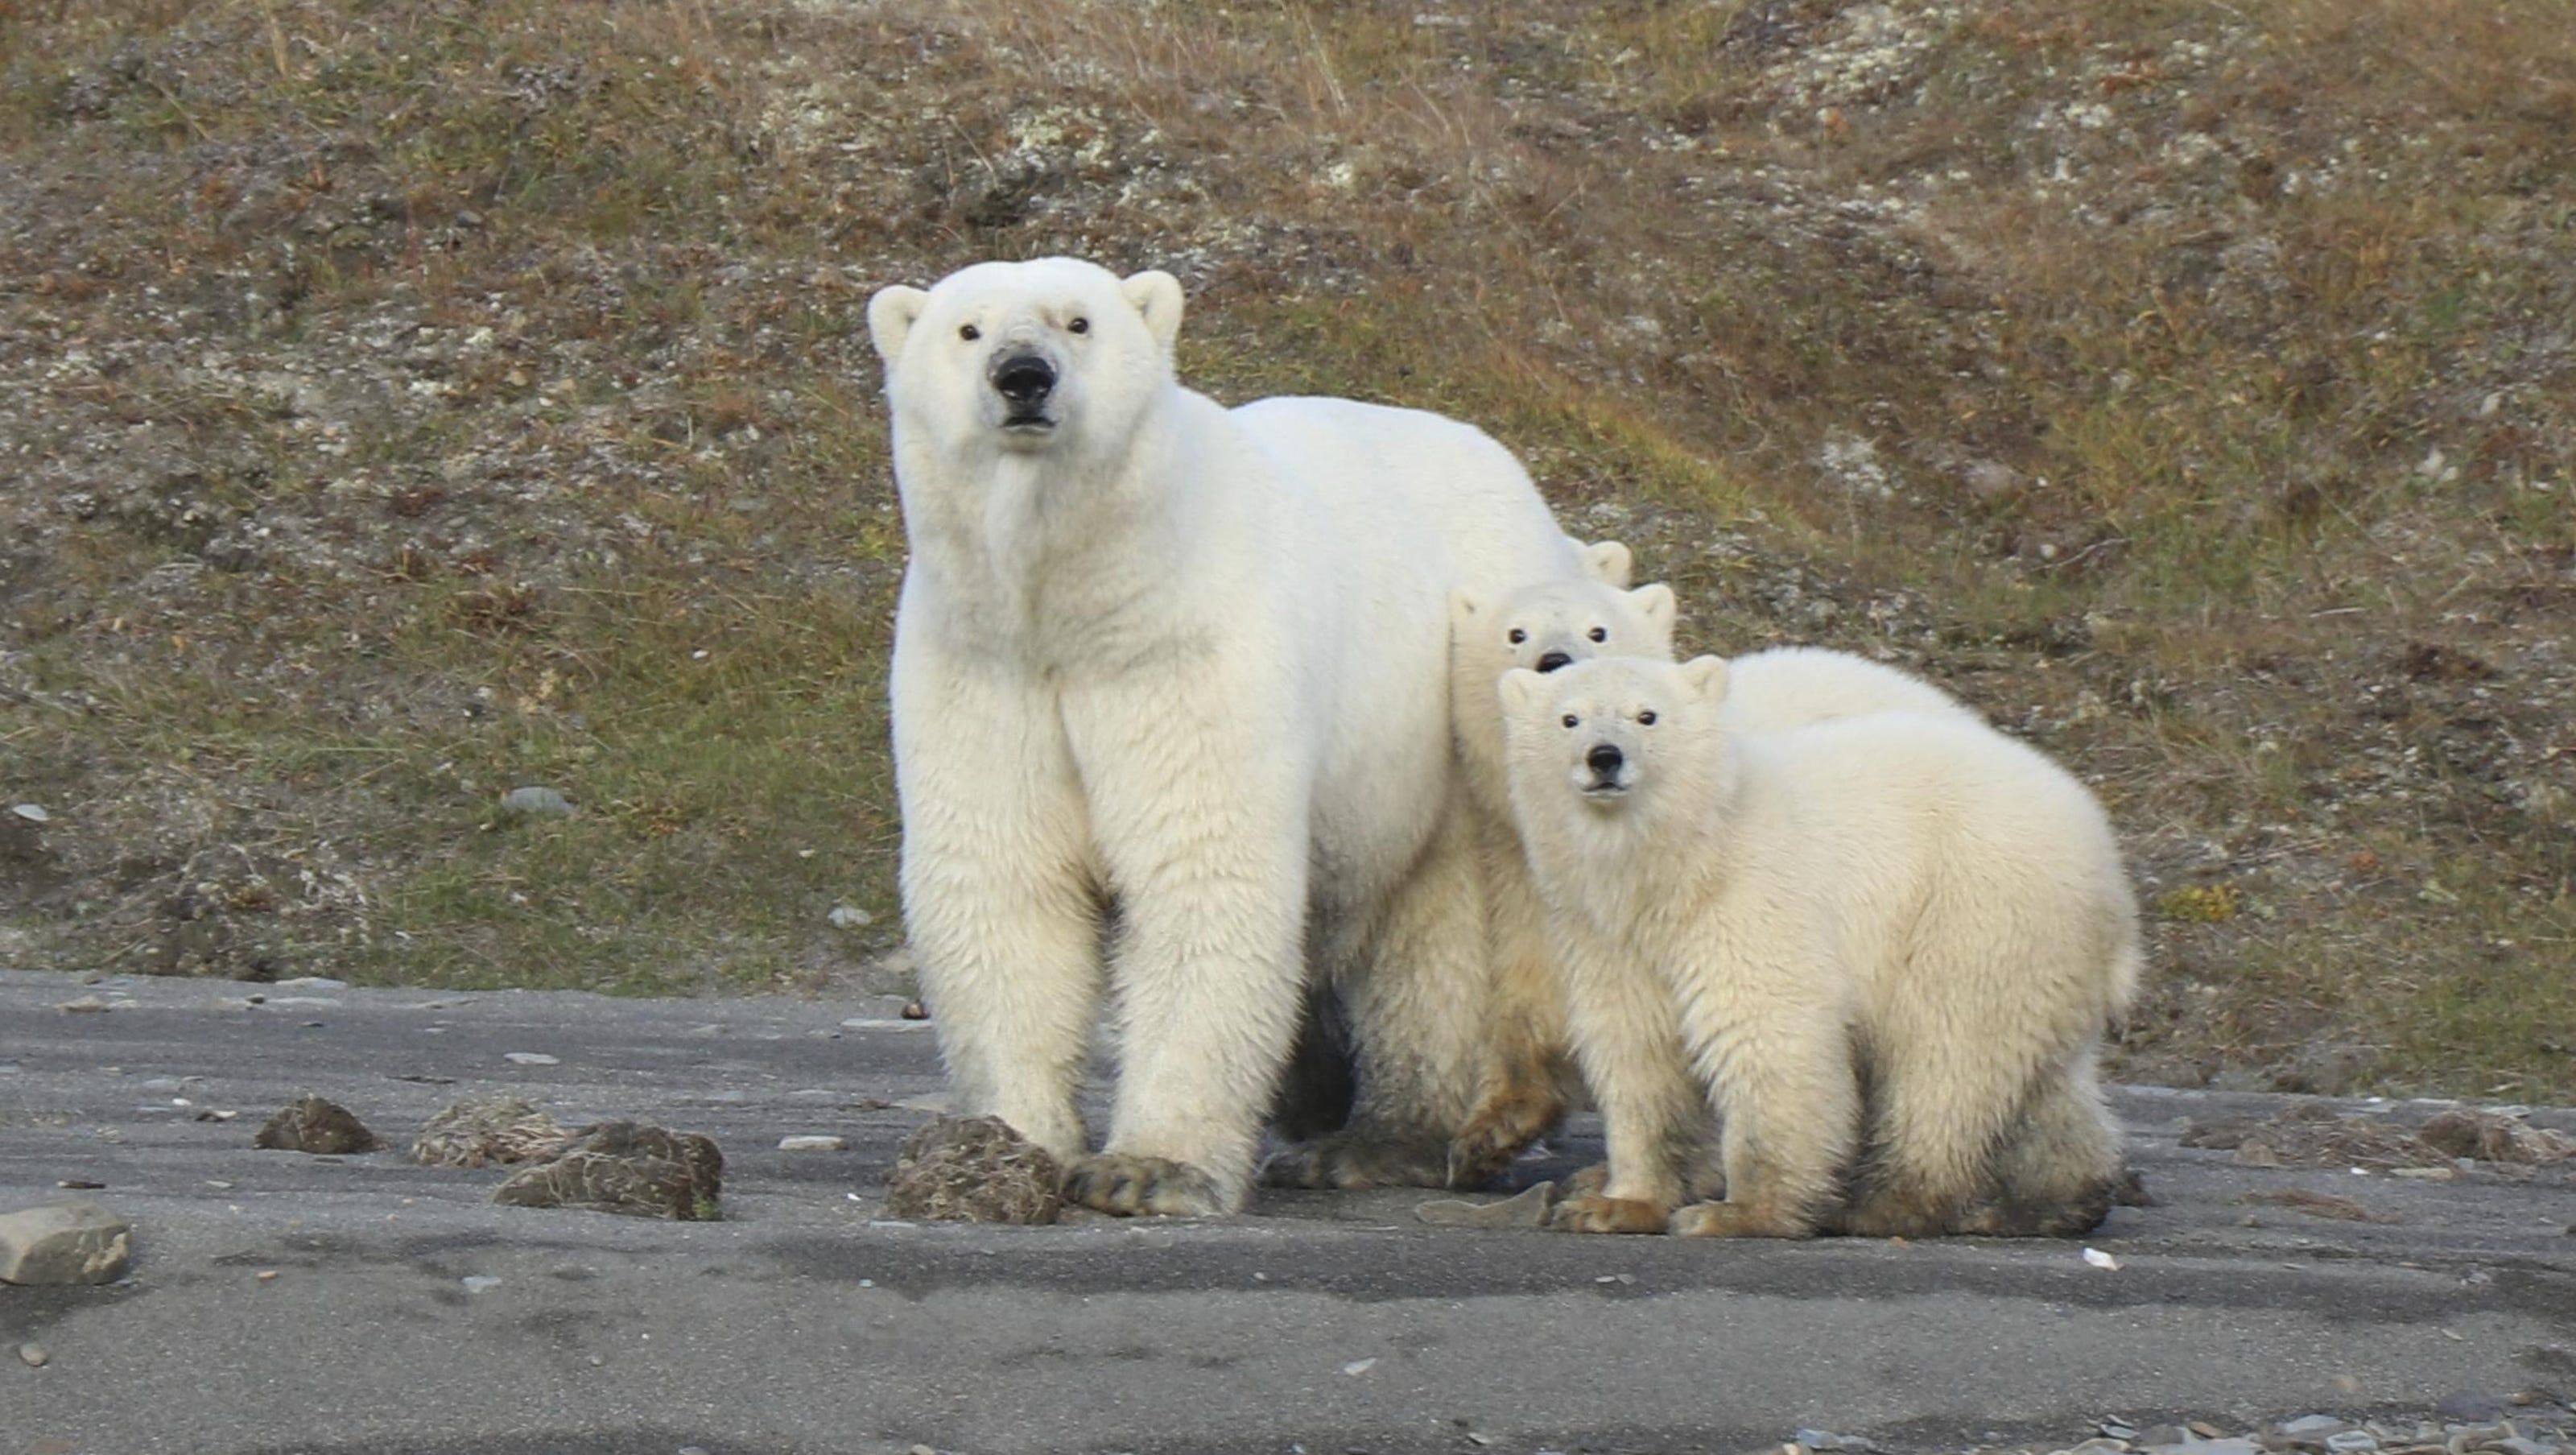 Study finds robust polar bear population in sea near Alaska